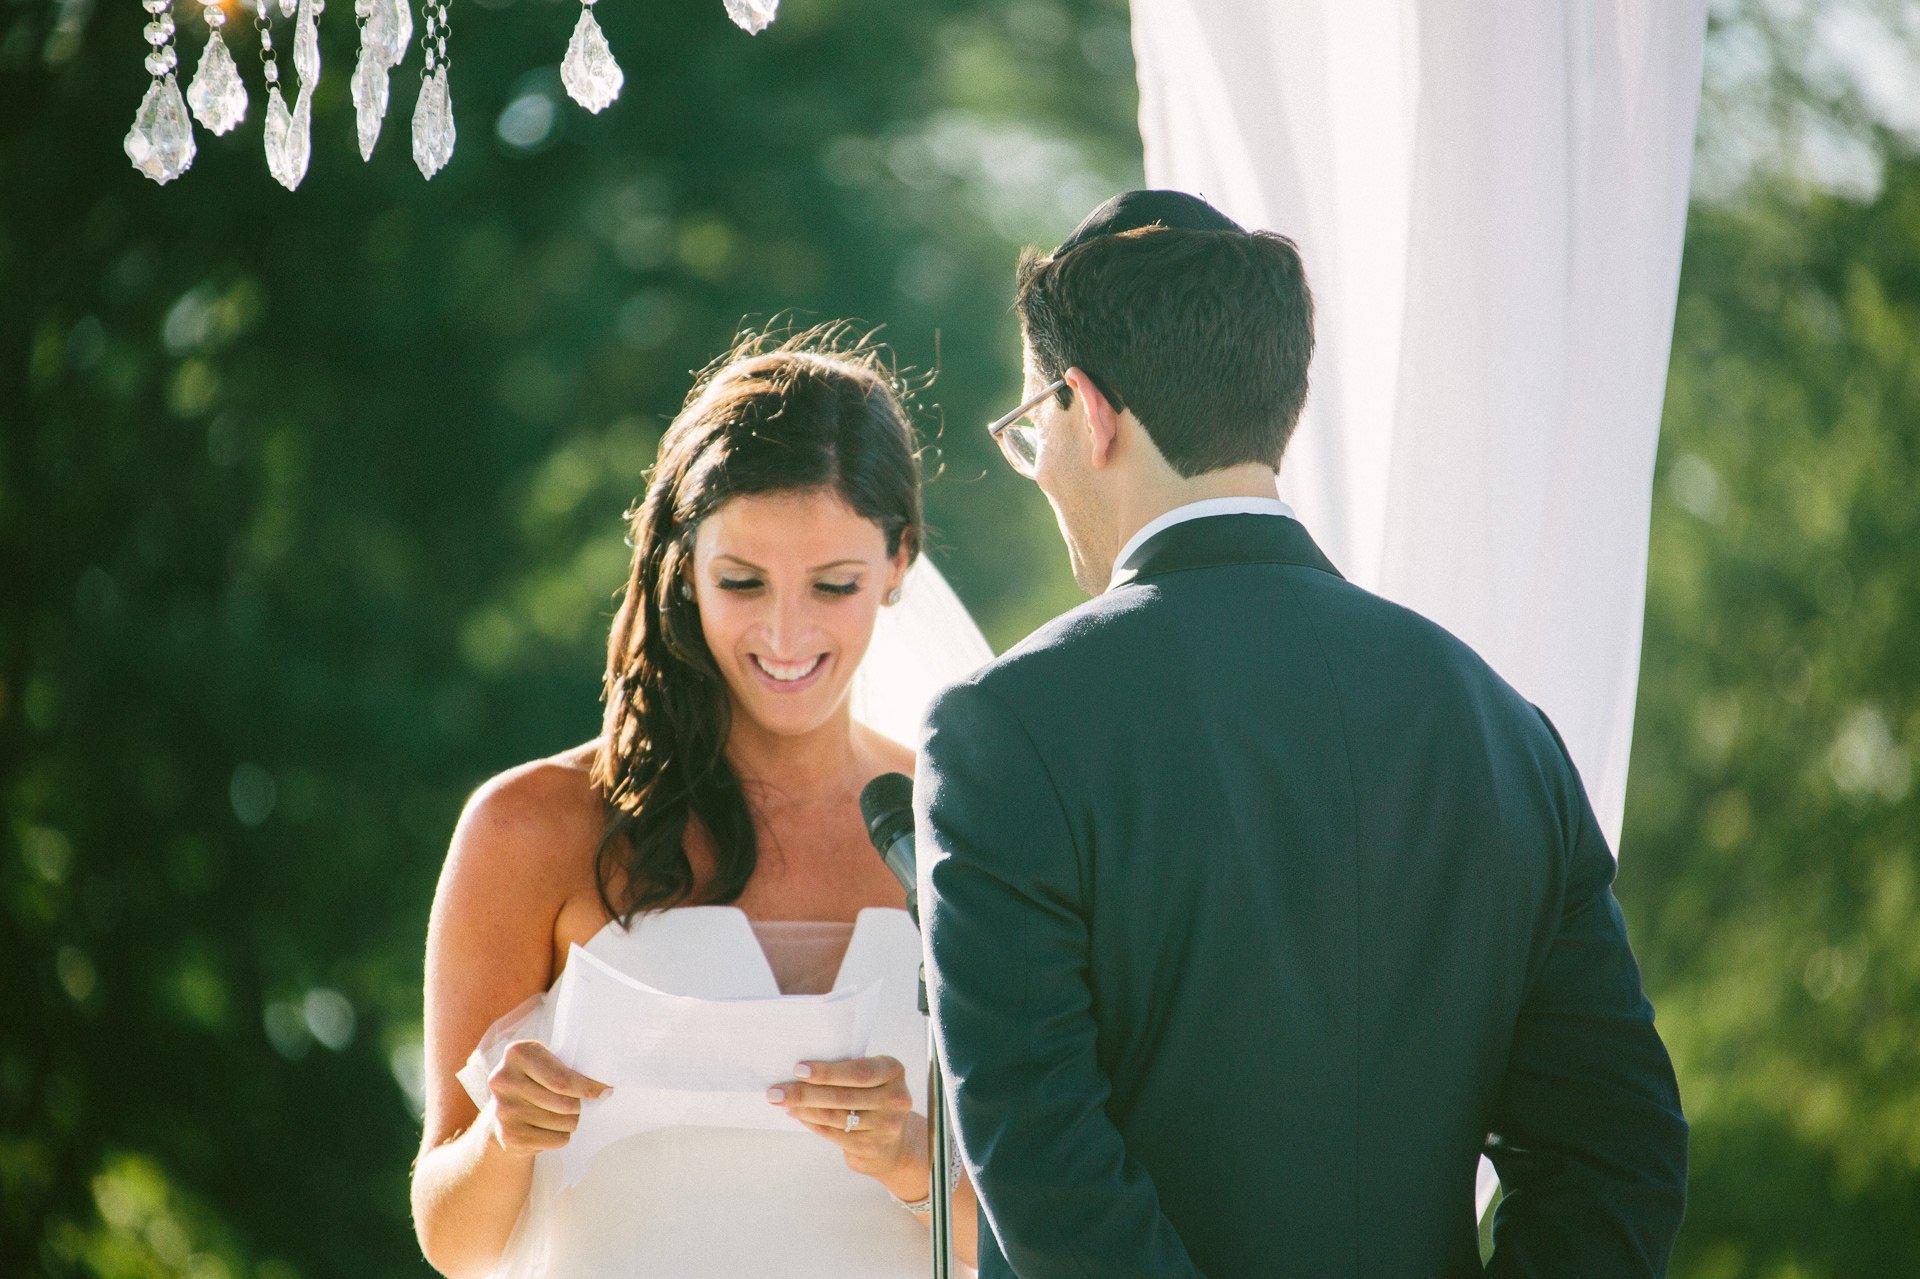 Beechmont Country Club Wedding Photographer in Beachwood 2 22.jpg